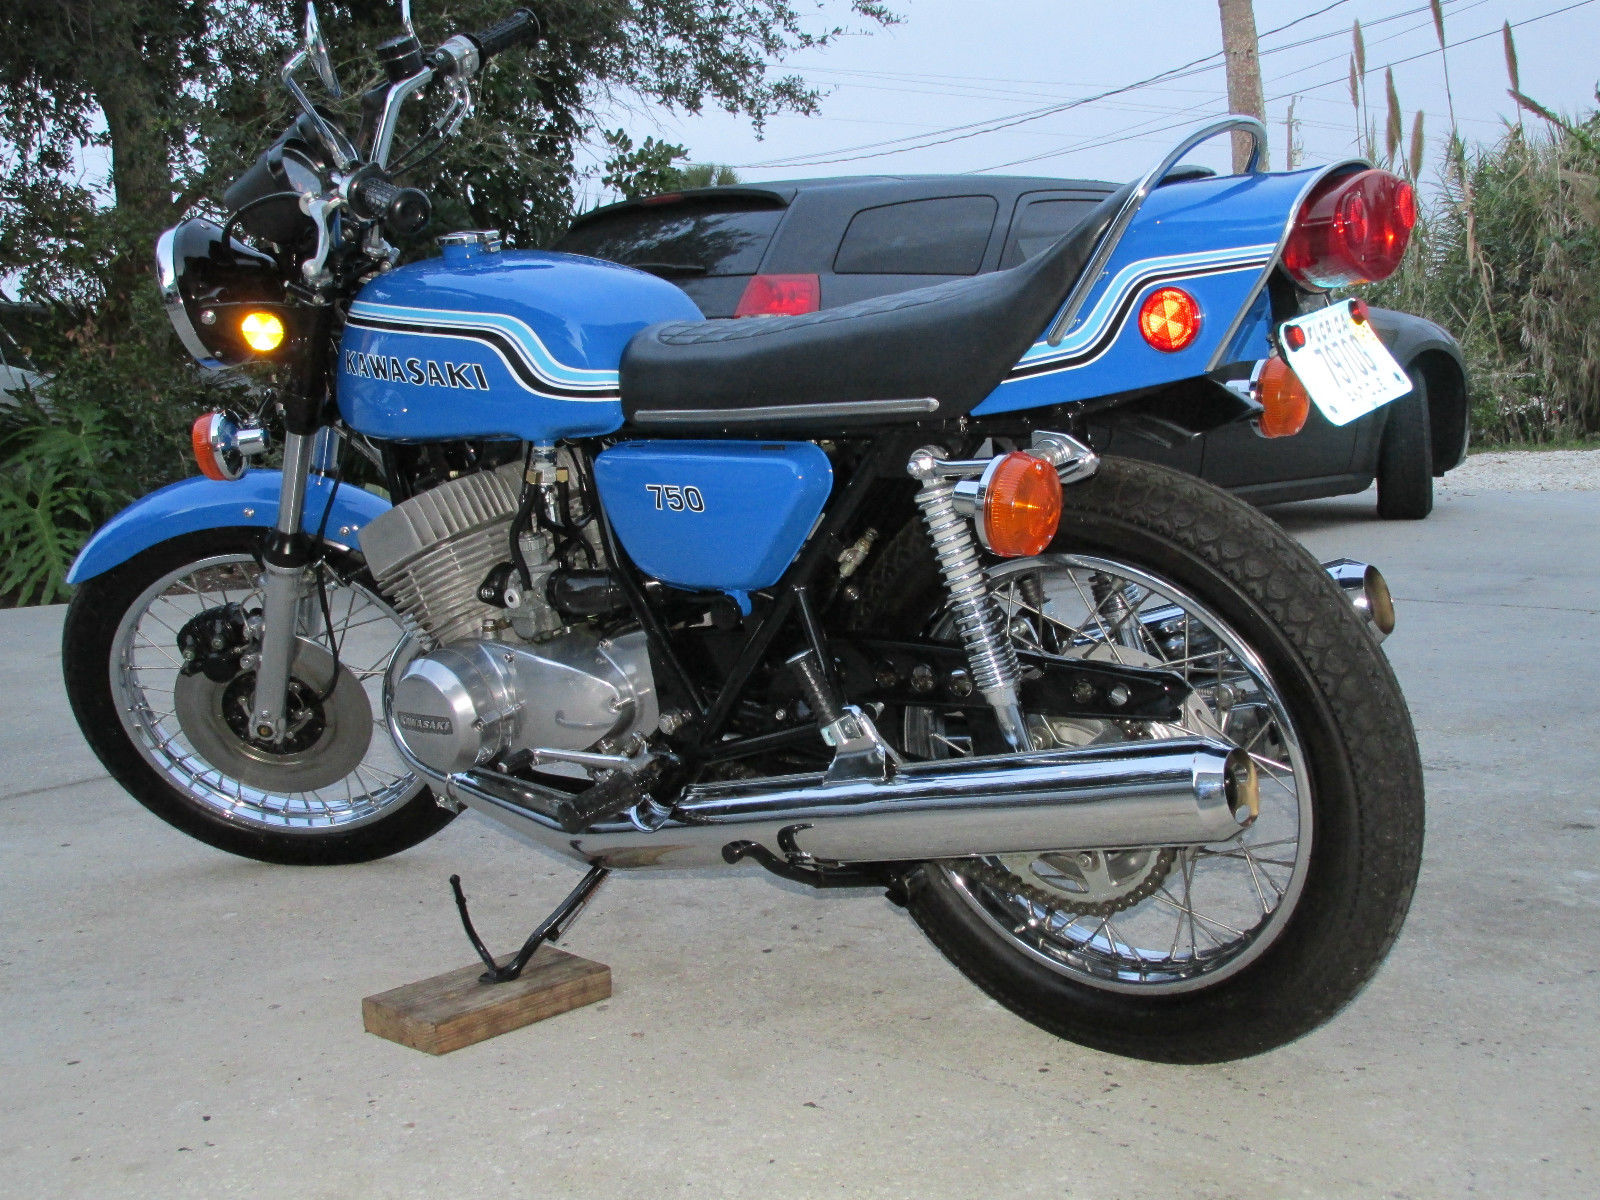 Kawasaki H2 - 1972 - Engine and Gearbox, Side Panel, Grab Rail and Muffler.